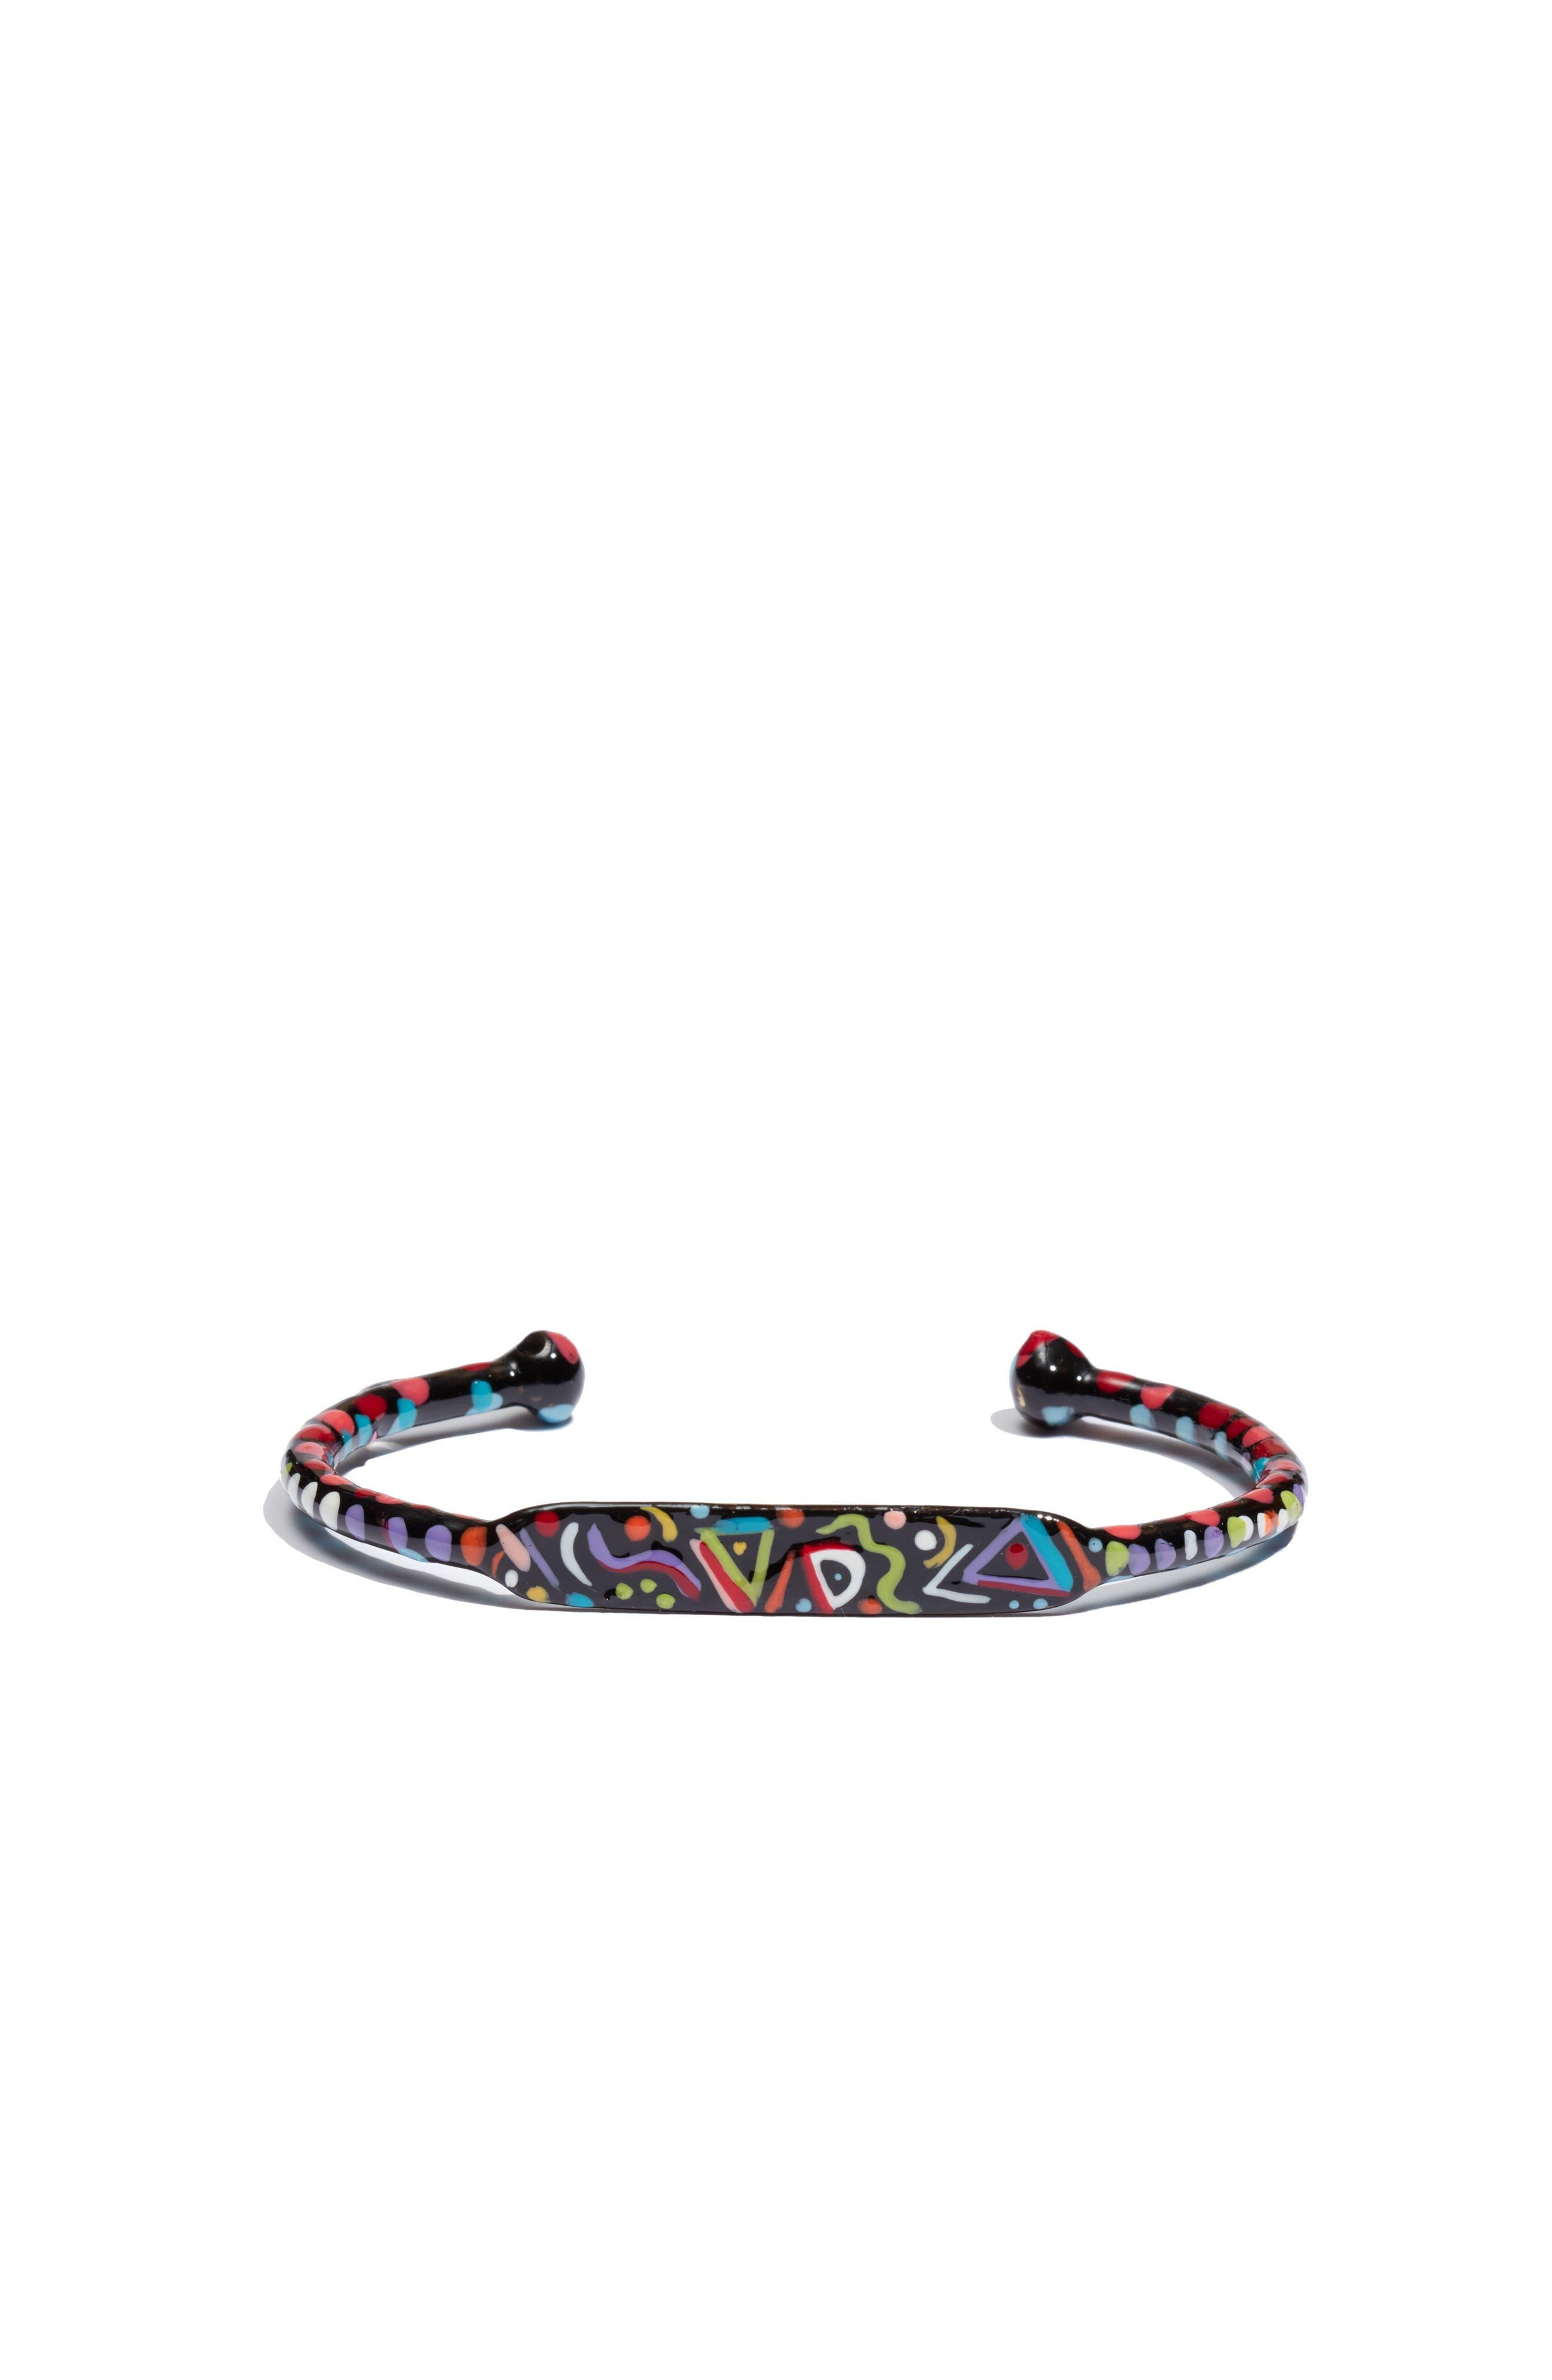 Kandinsky Bracelet,                             Main thumbnail 1, color,                             001